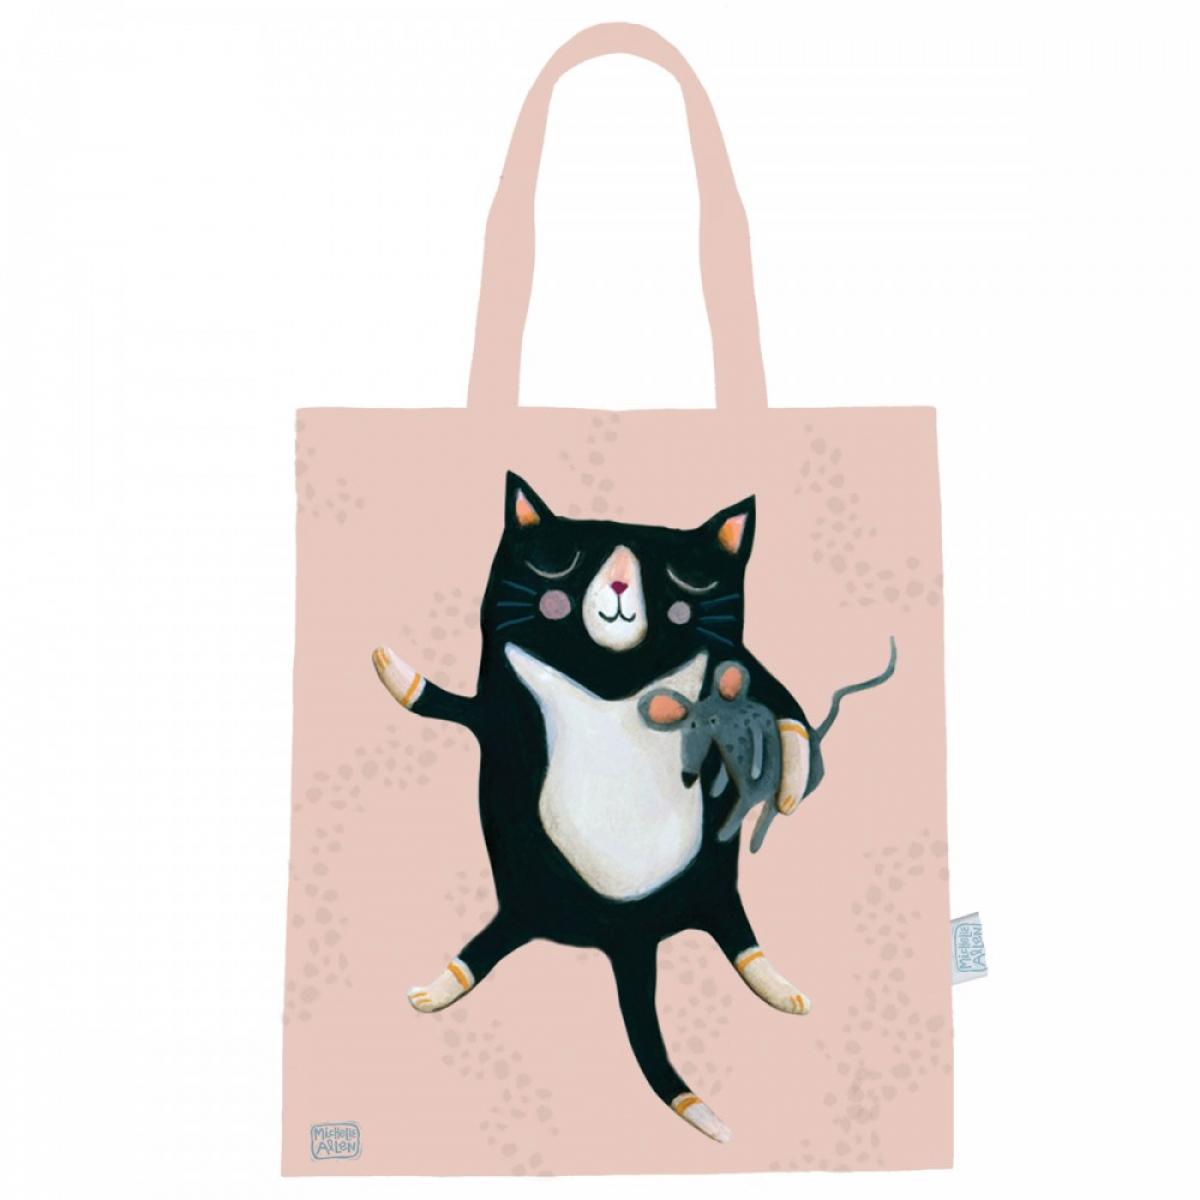 Sac coton / tote bag \'Allen Designs\' rose (chat) - 44x38 cm - [A1988]